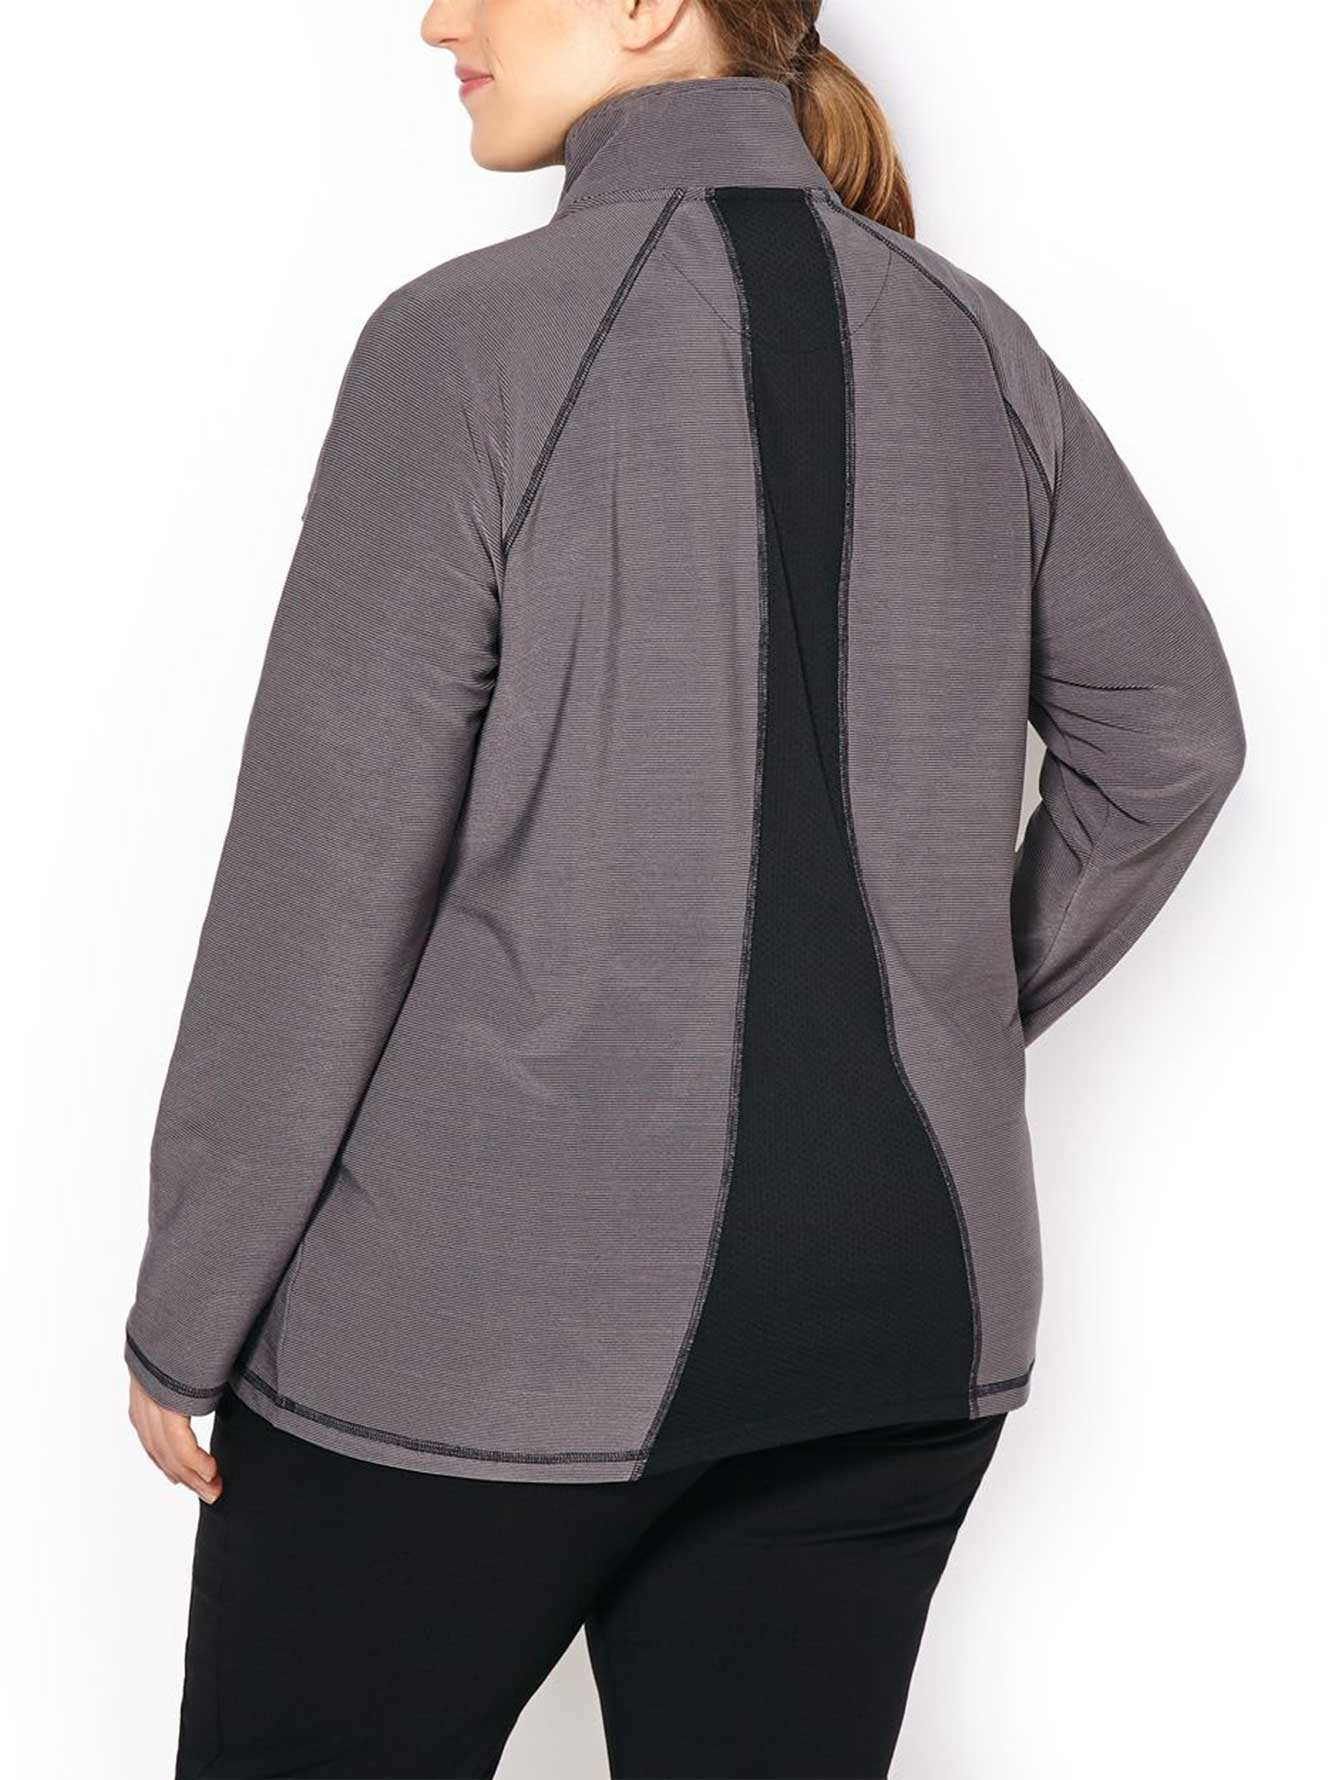 activezone golf veste taille plus penningtons. Black Bedroom Furniture Sets. Home Design Ideas